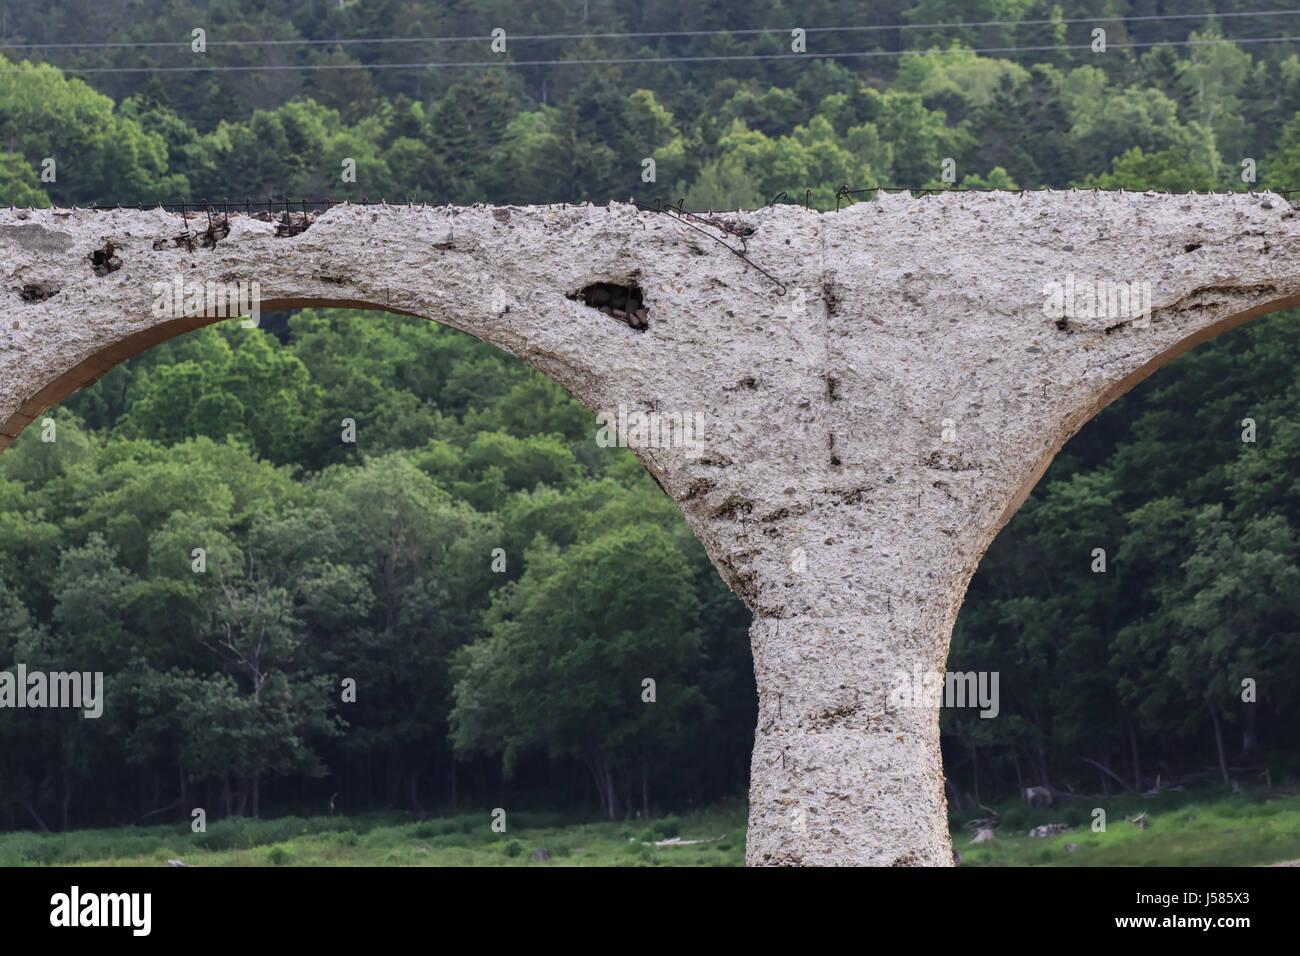 Higashi Taisetsu Arch Bridges Stock Photo